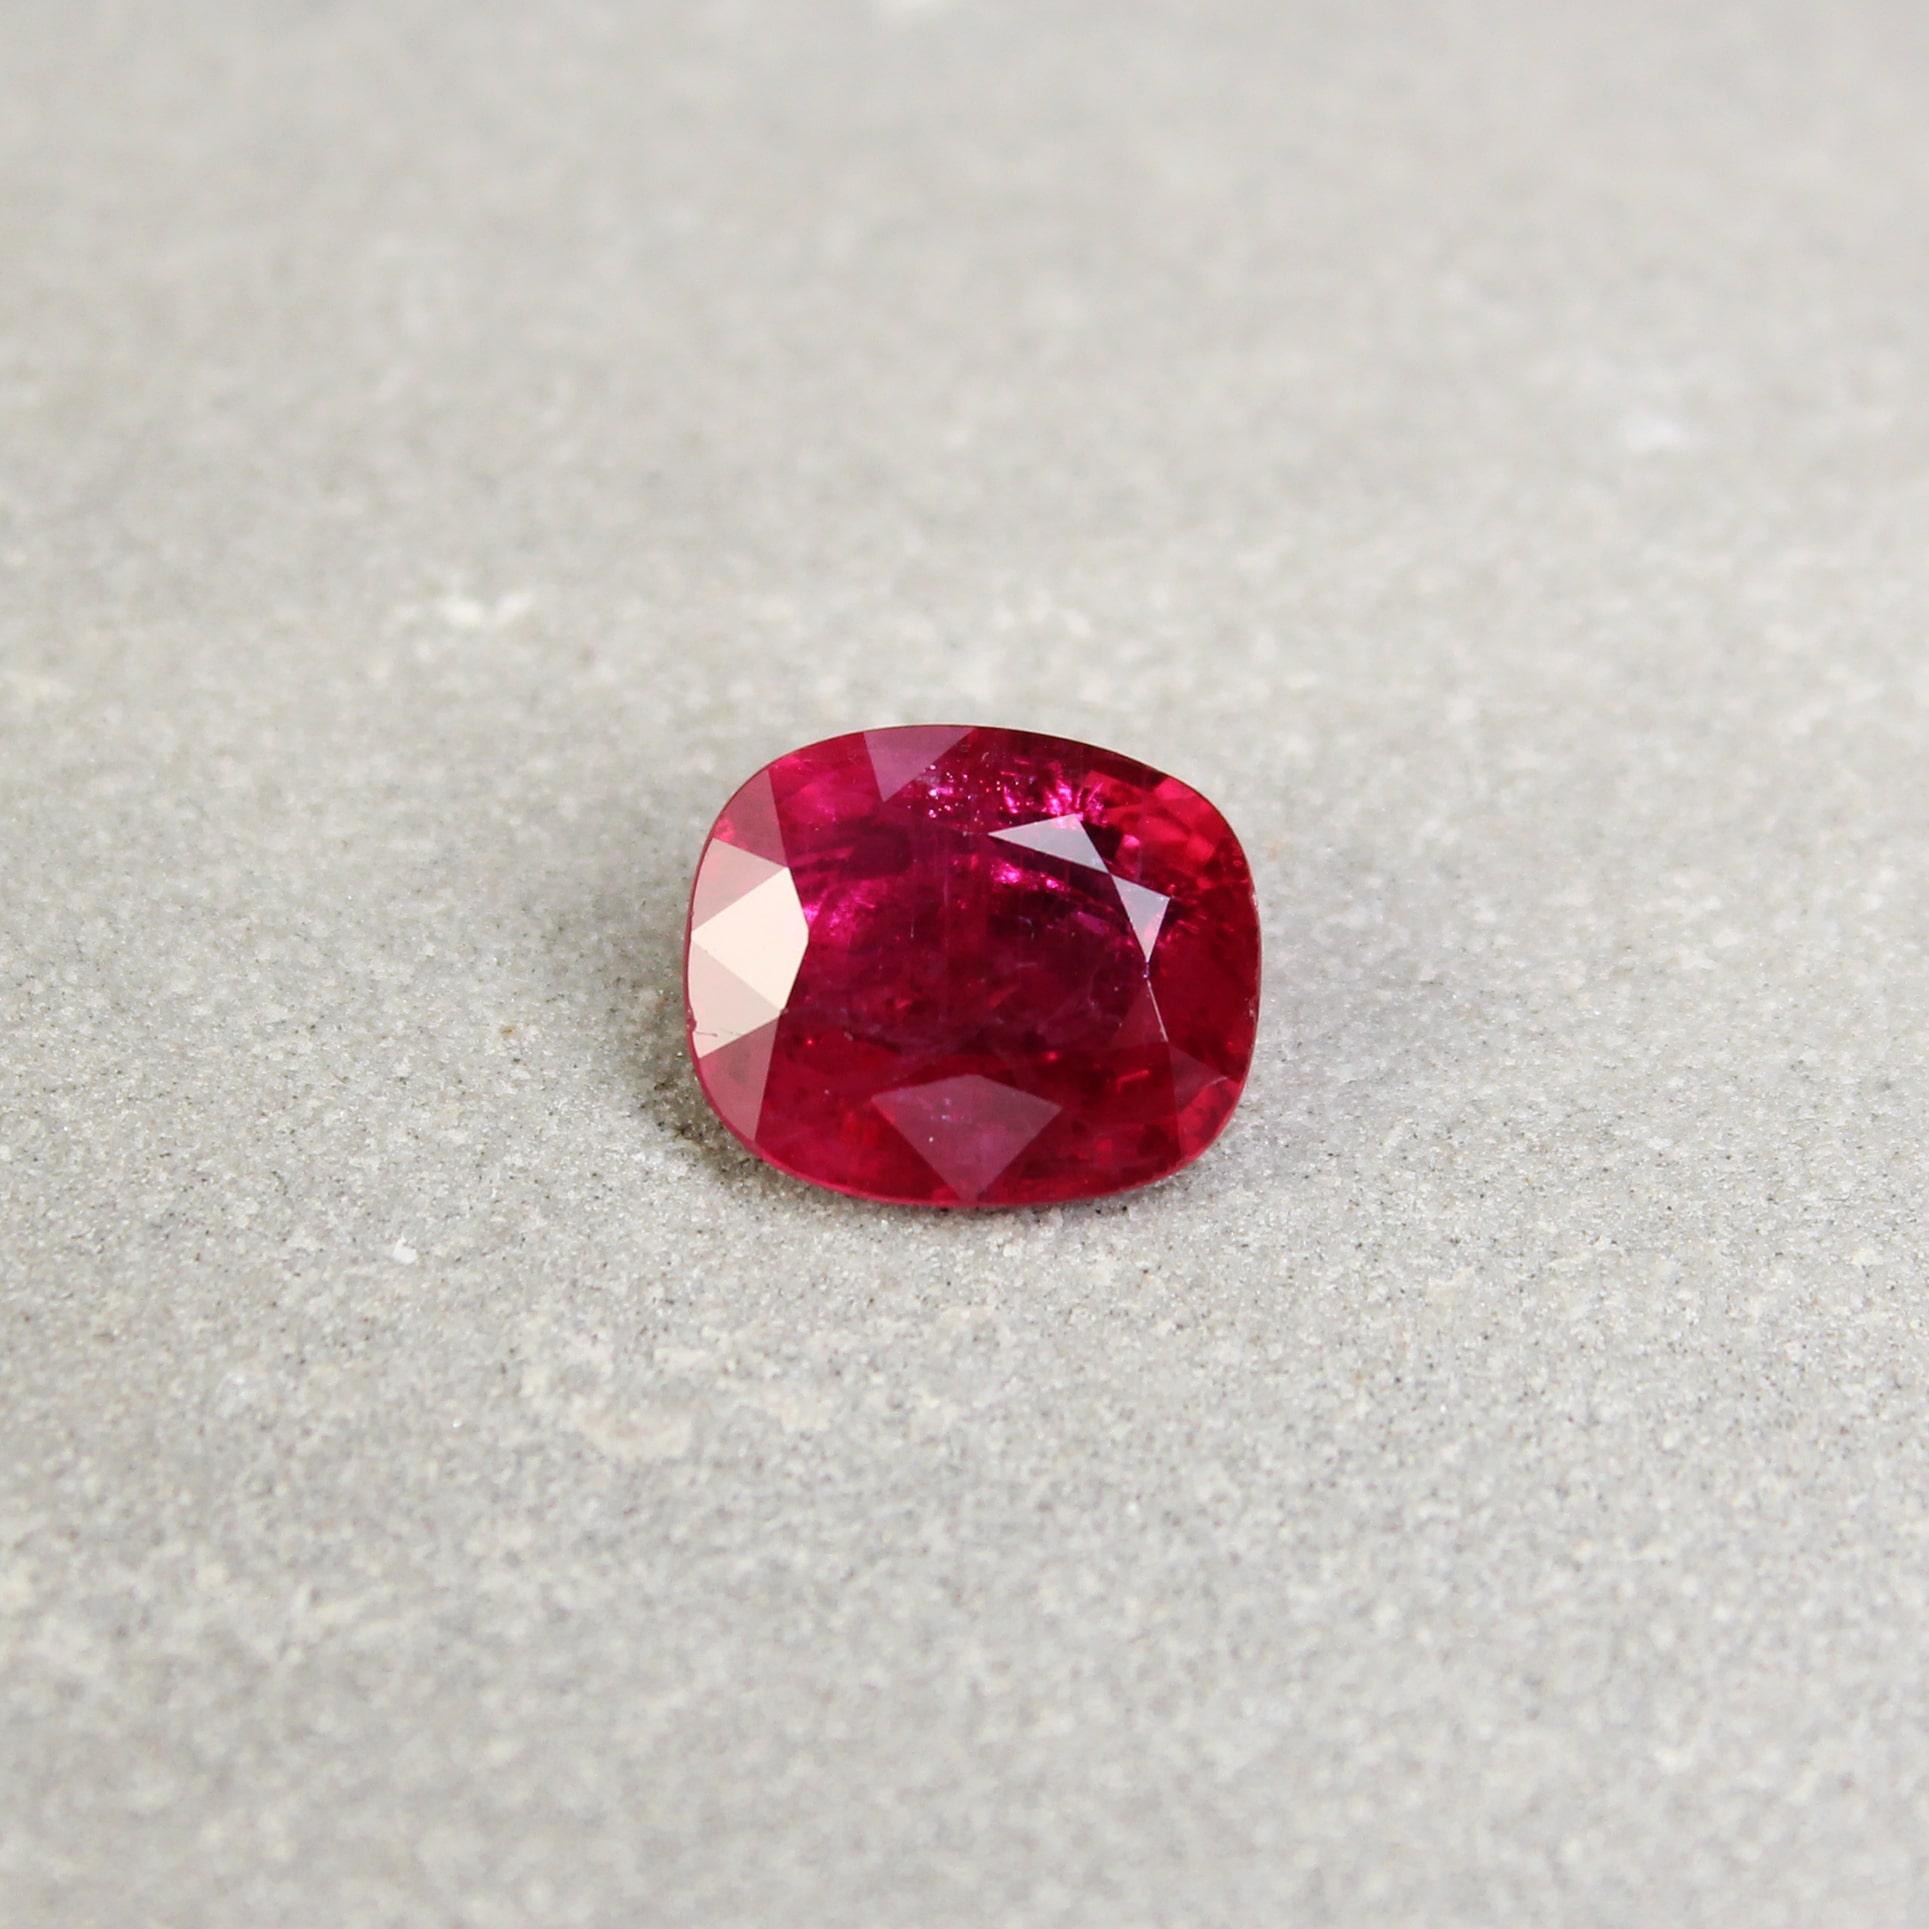 3.26 ct purplish red cushion ruby